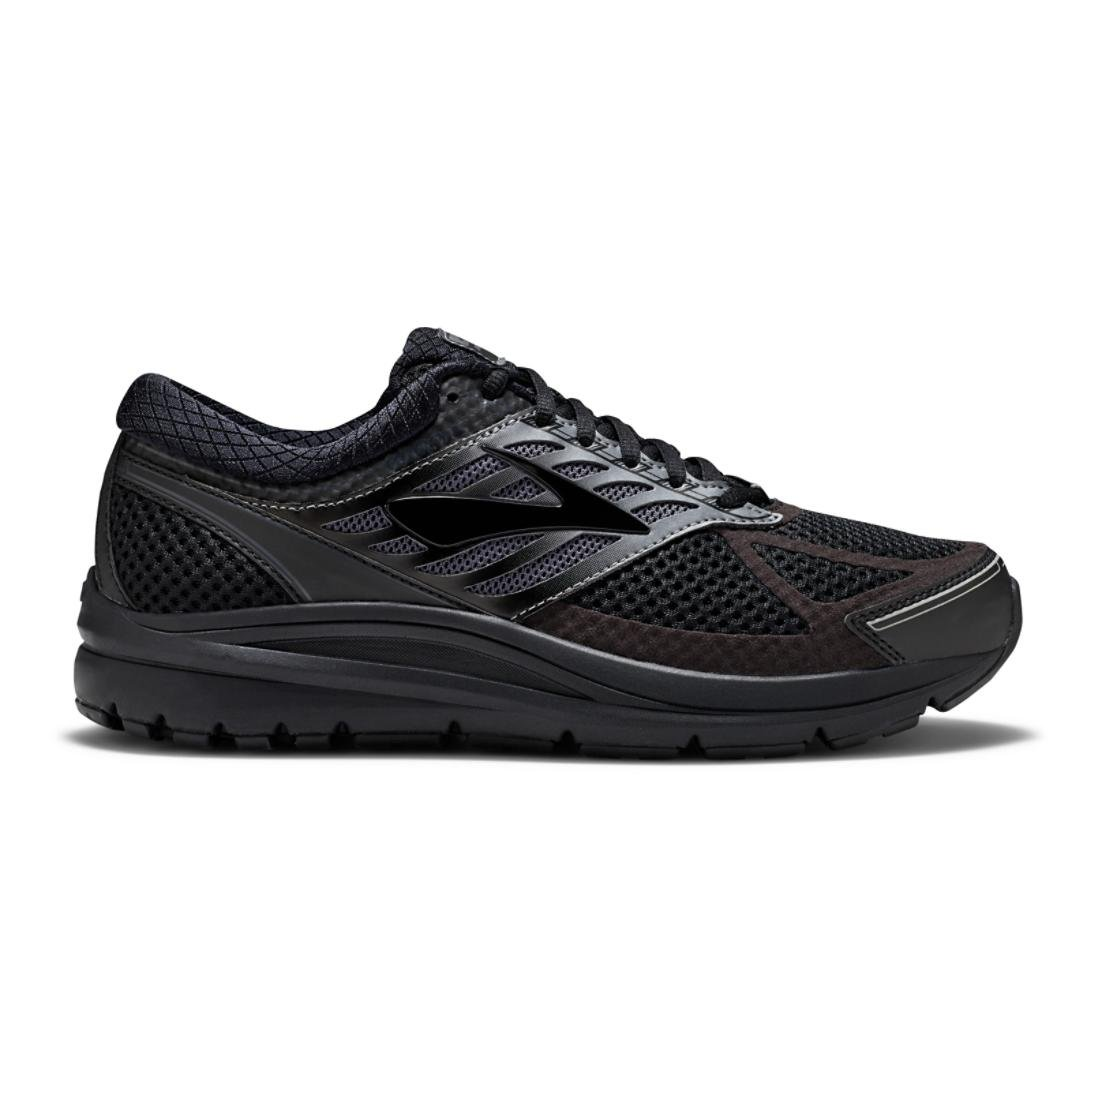 Brooks Addiction 13, Zapatillas de Running para Hombre 45.5 EU Negro (Black/Ebony 071)